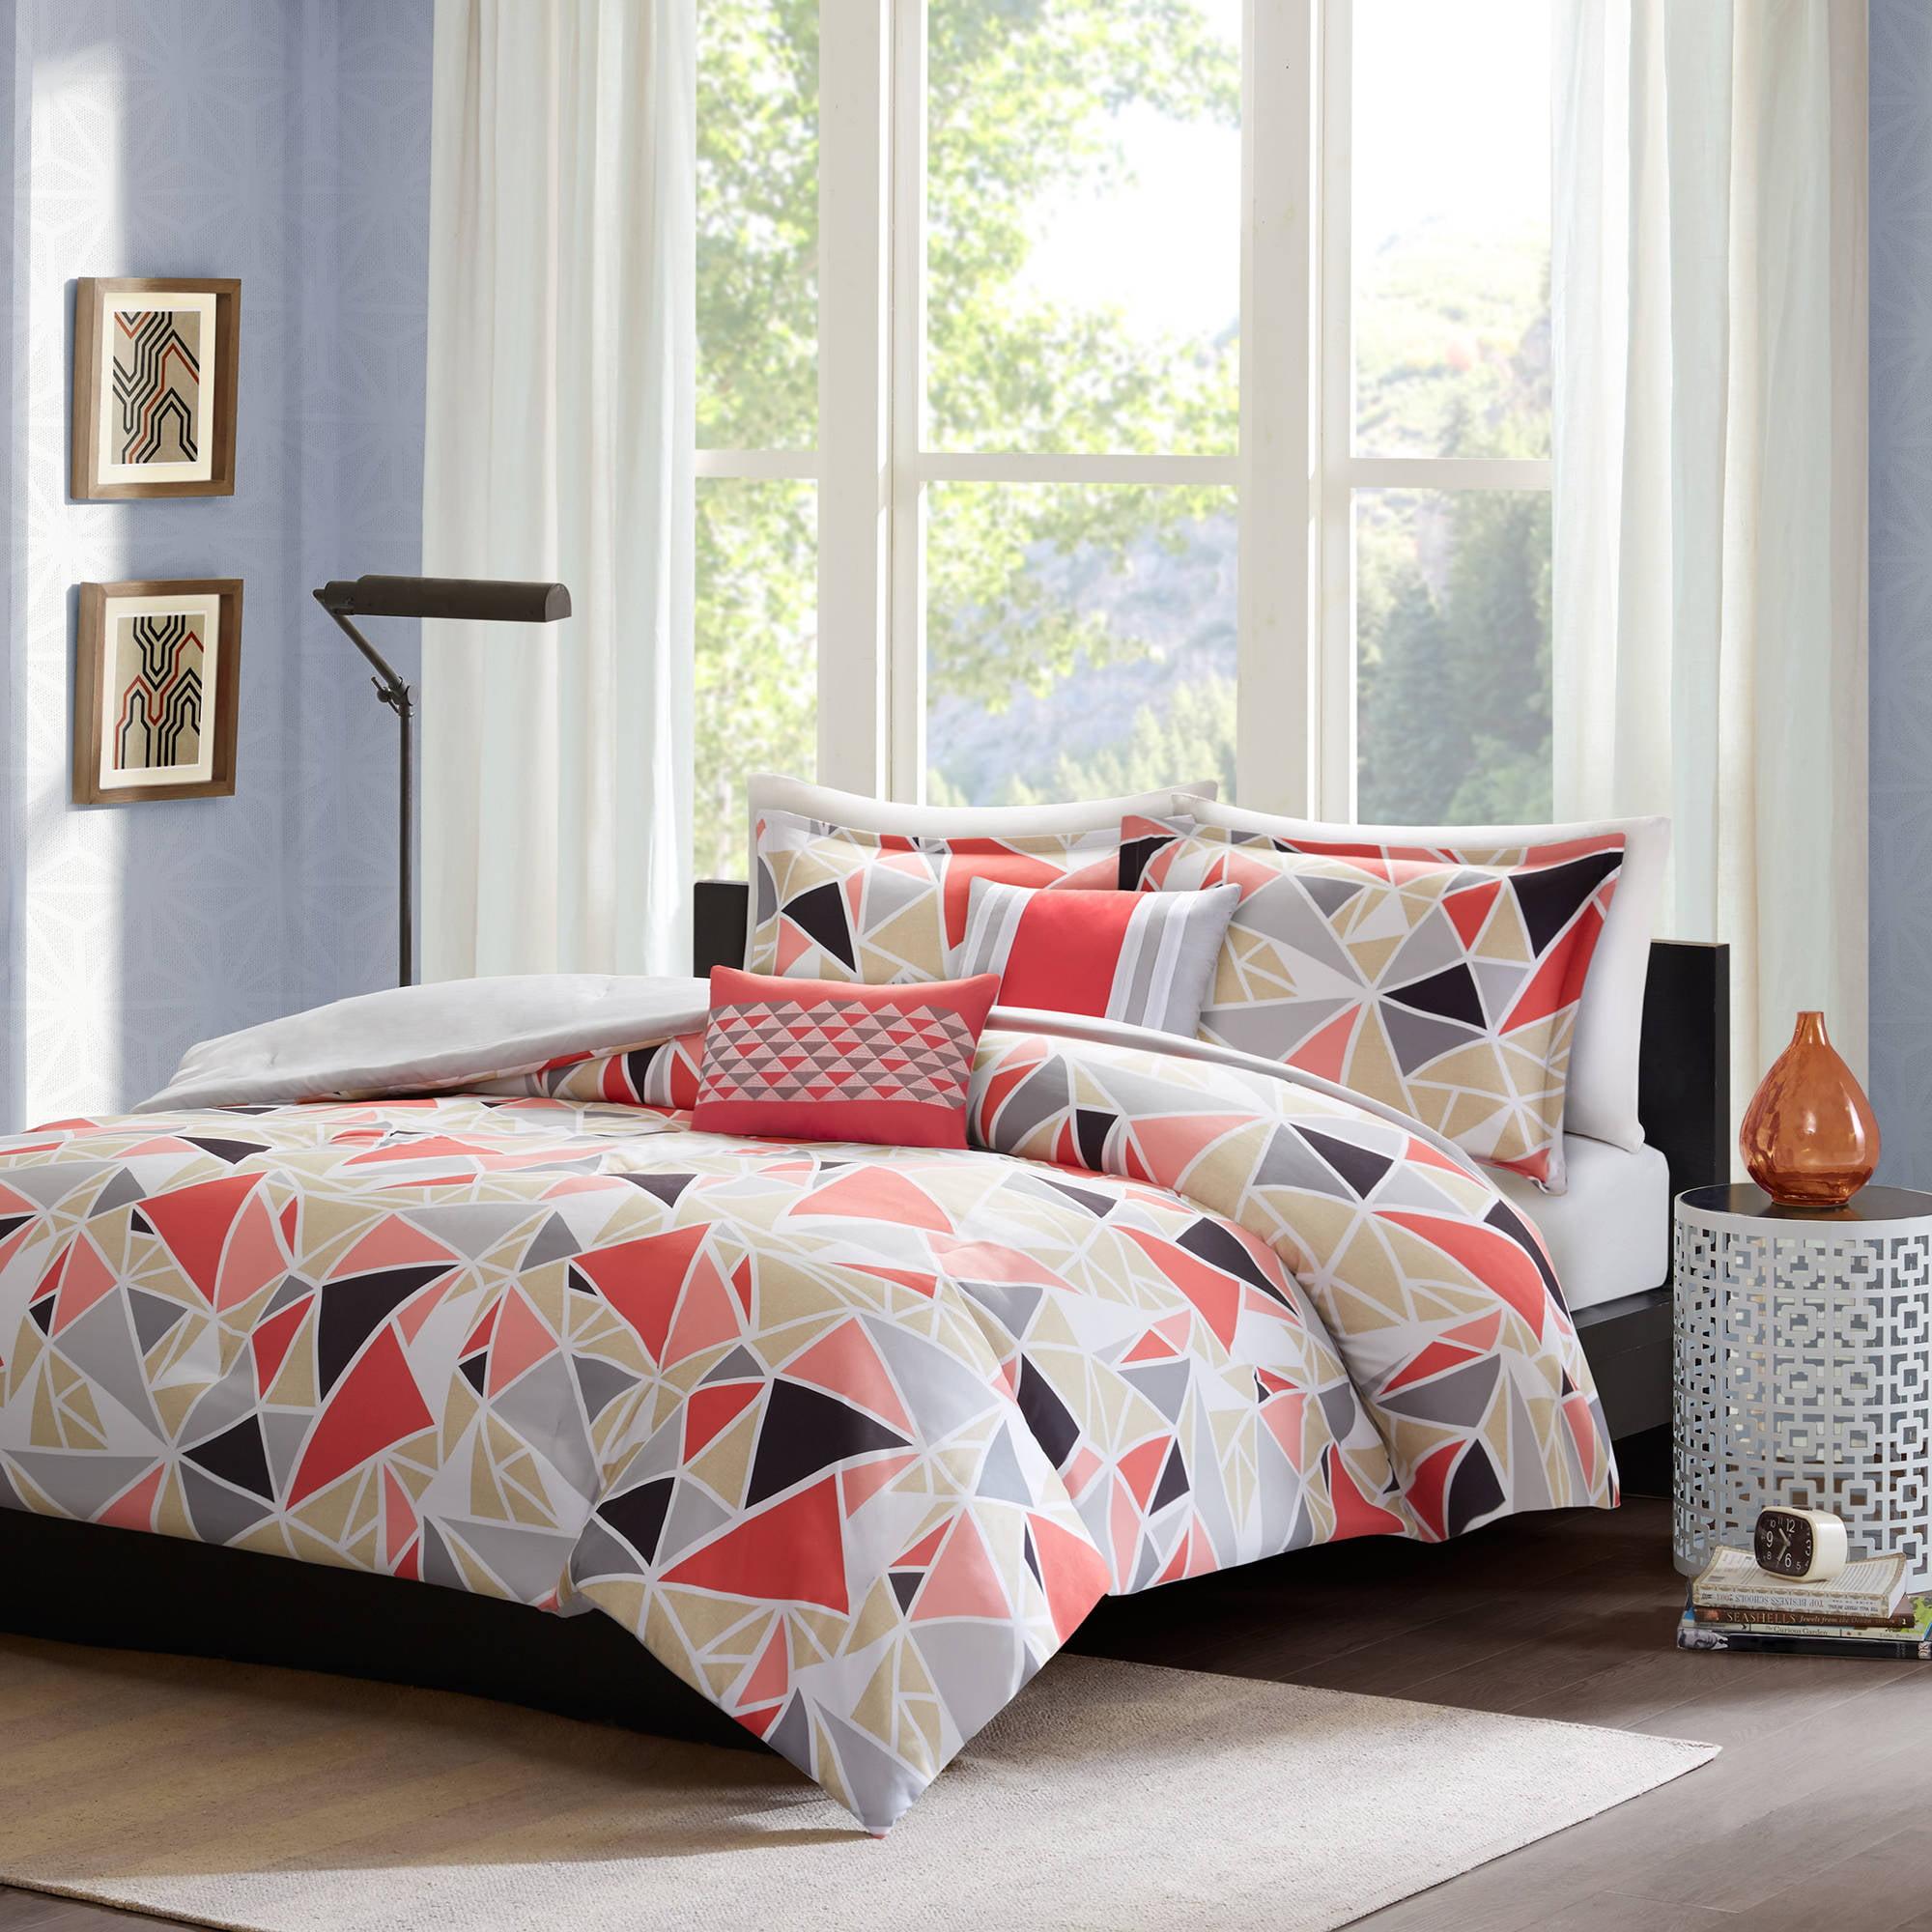 Home Essence Apartment Jasmine 4-Piece Comforter Set